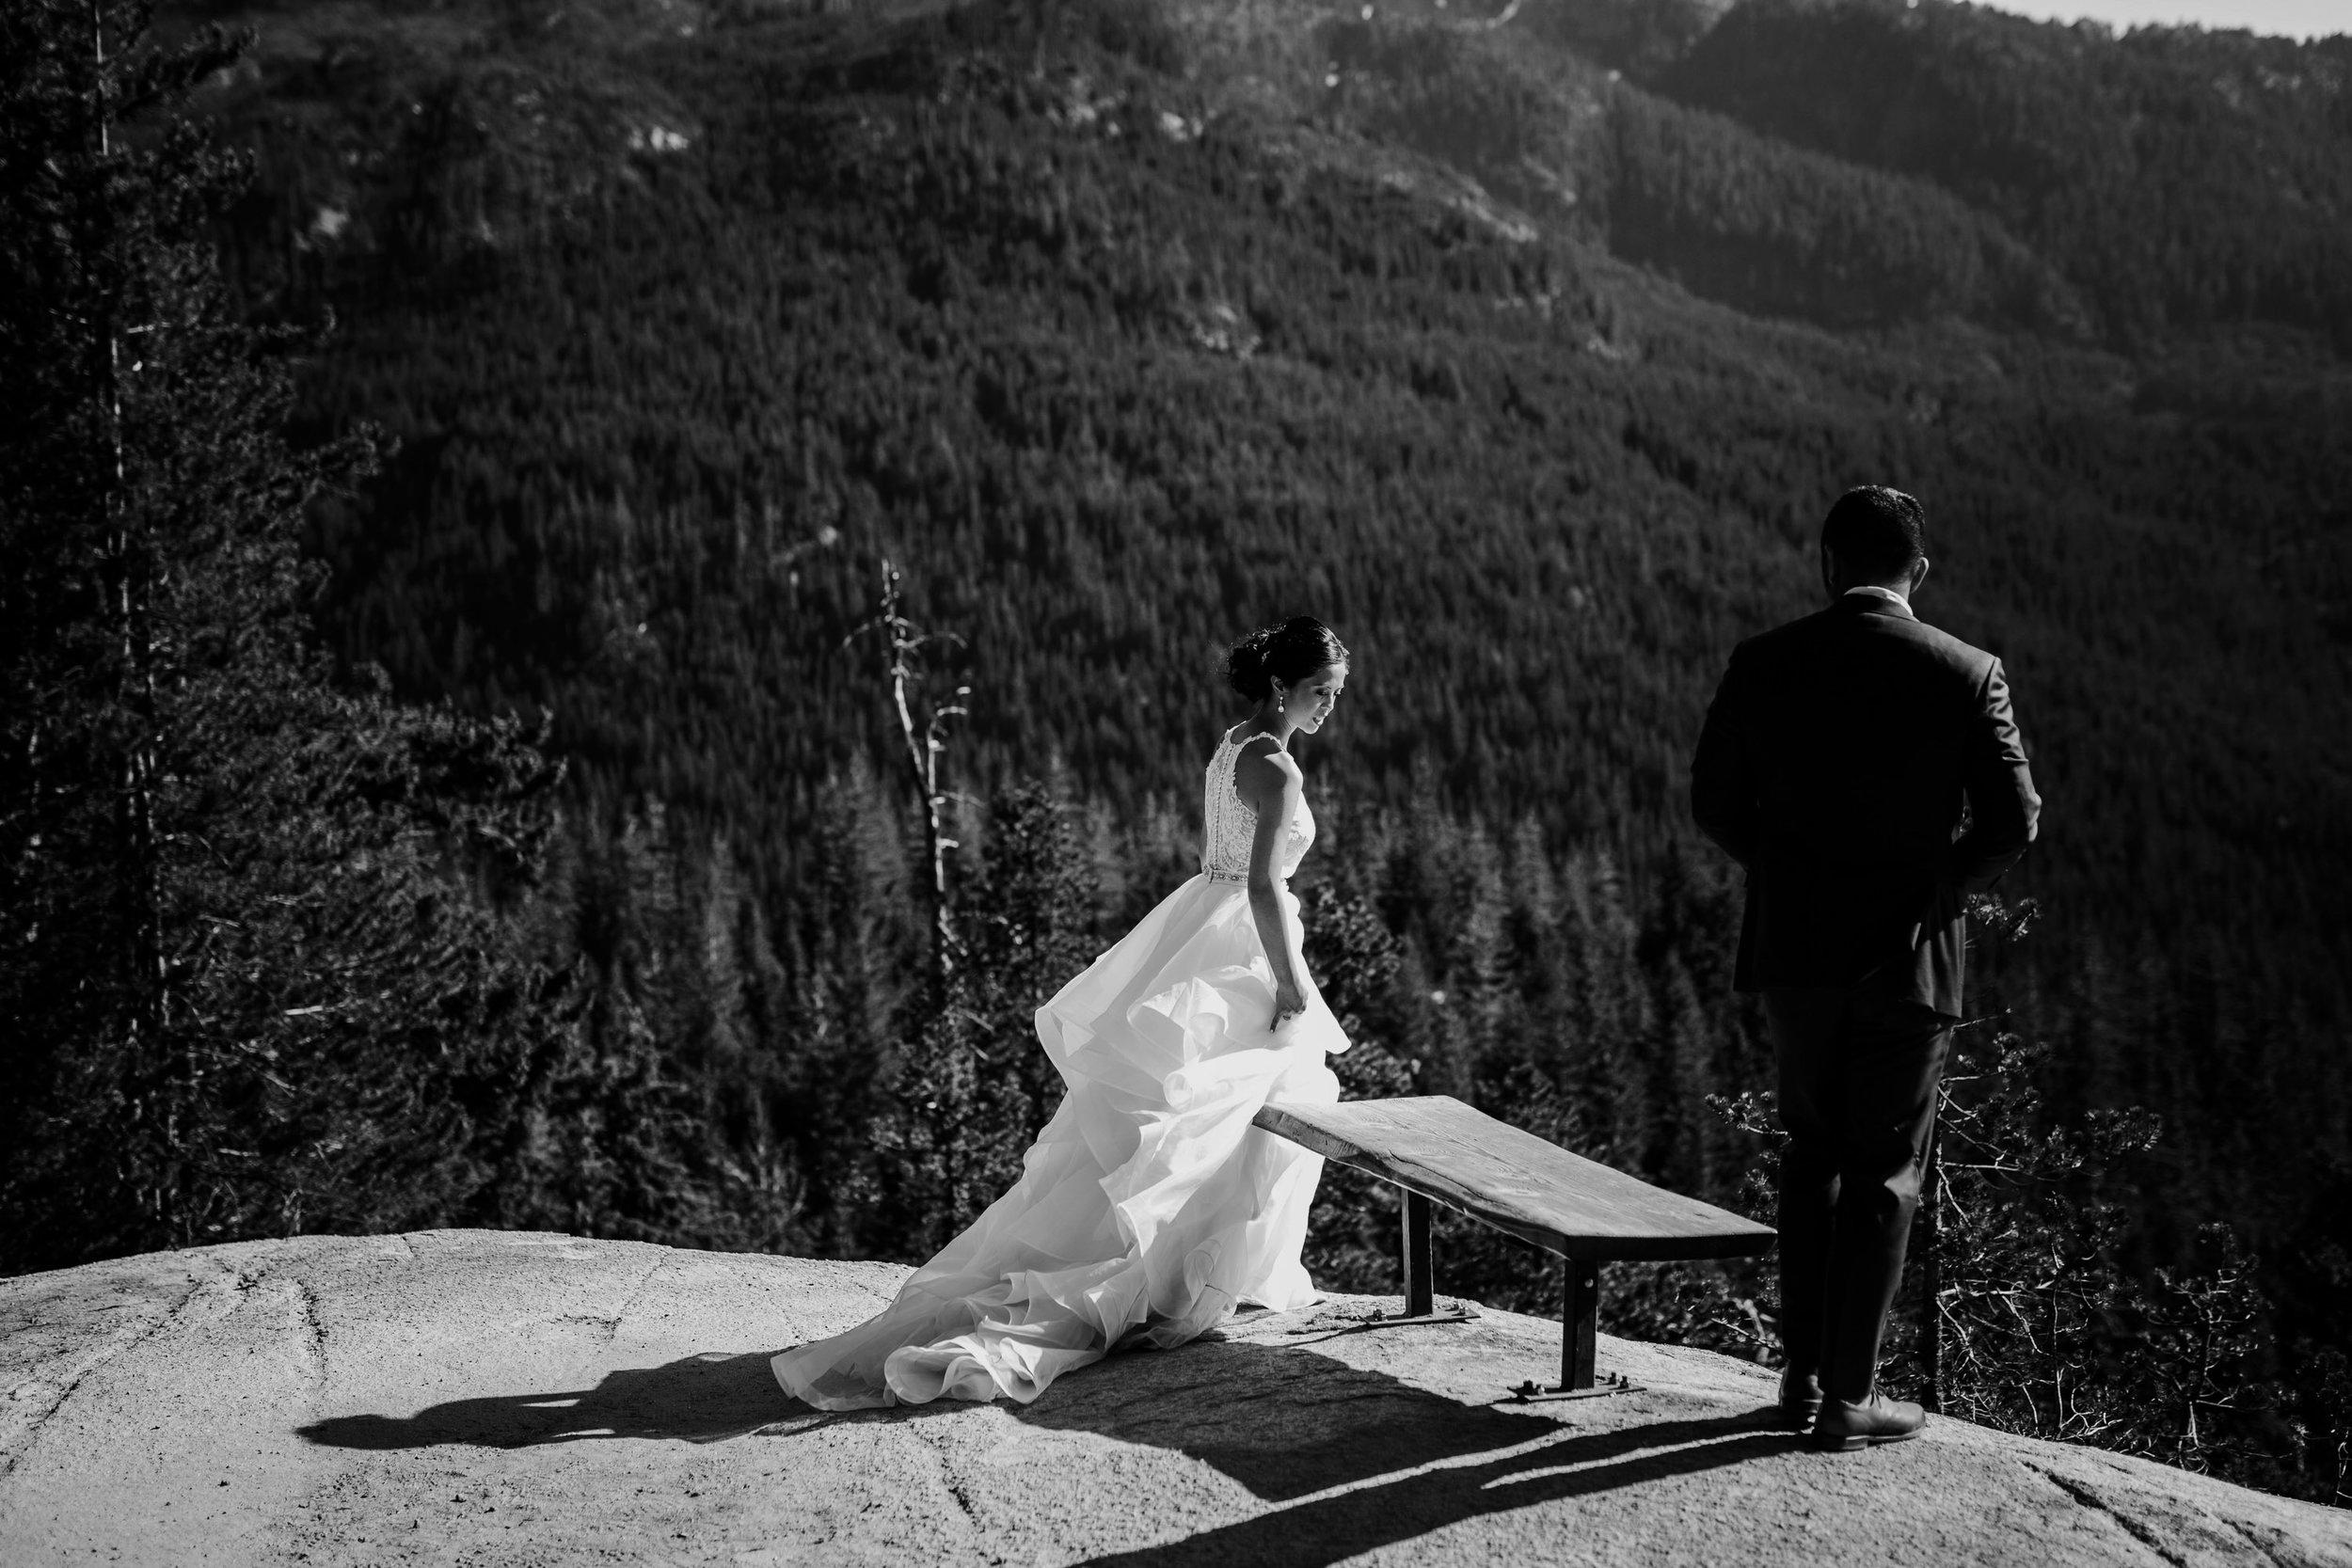 Squamish Wedding Photographer - Sea to Sky Gondola Wedding Photos -  Vancouver Wedding Photographer & Videographer - Sunshine Coast Wedding Photos - Sunshine Coast Wedding Photographer - Jennifer Picard Photography - IMG_3576.jpg